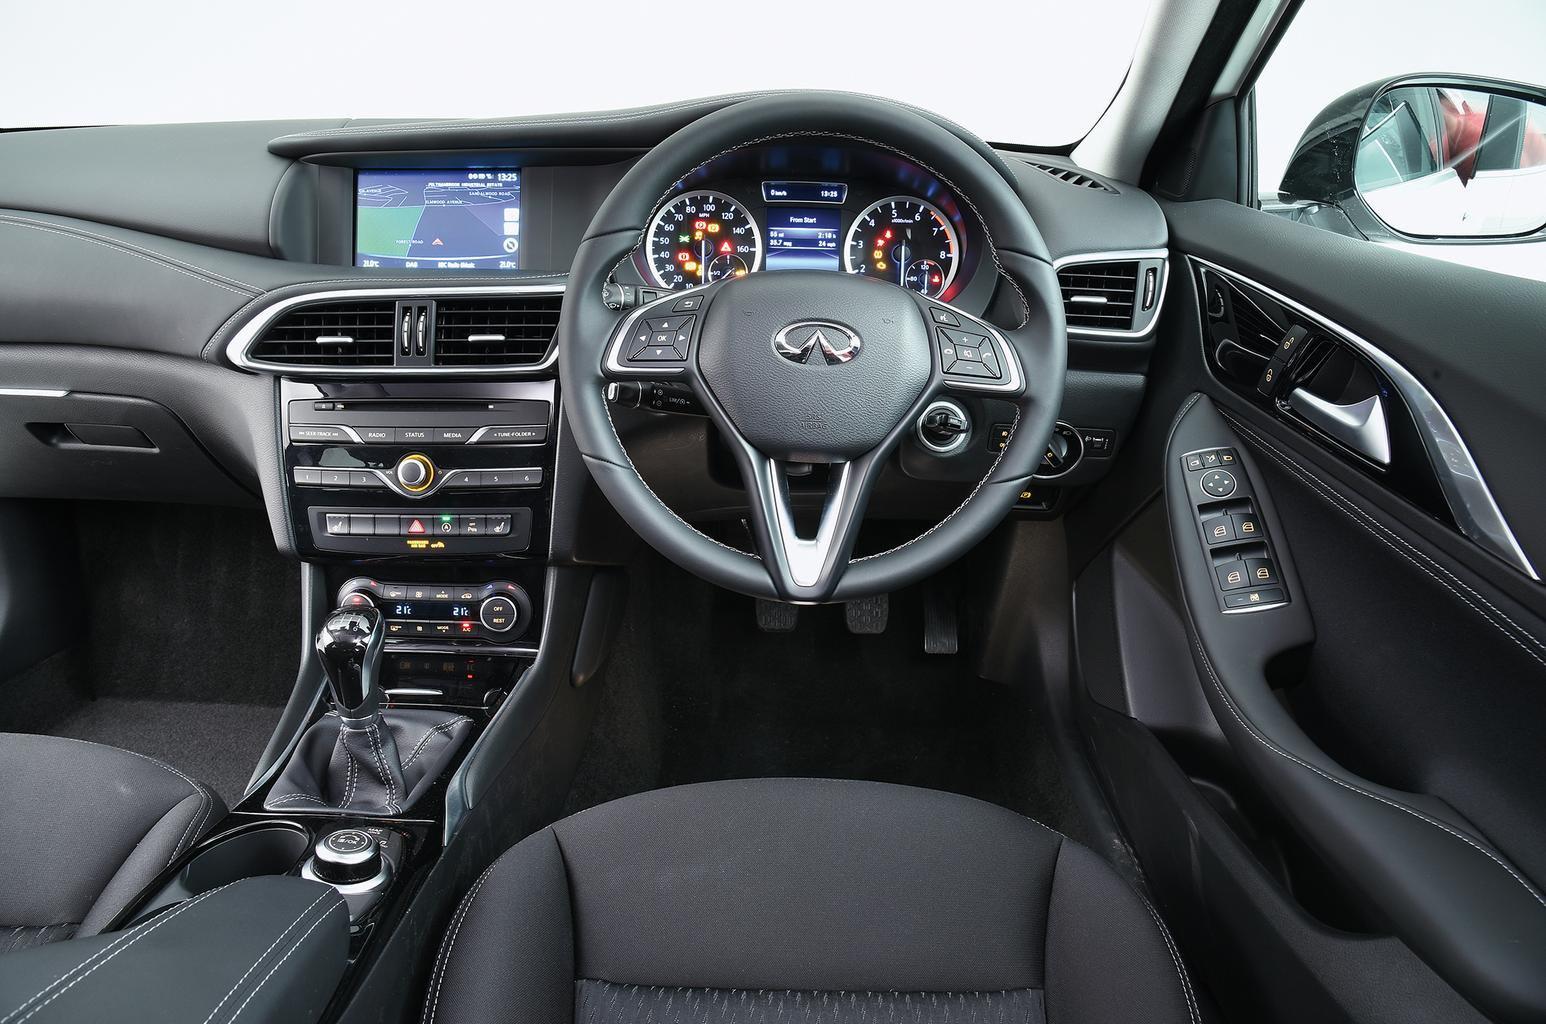 Audi A3 Sportback vs BMW 1 Series vs Infiniti Q30: What are they like inside?